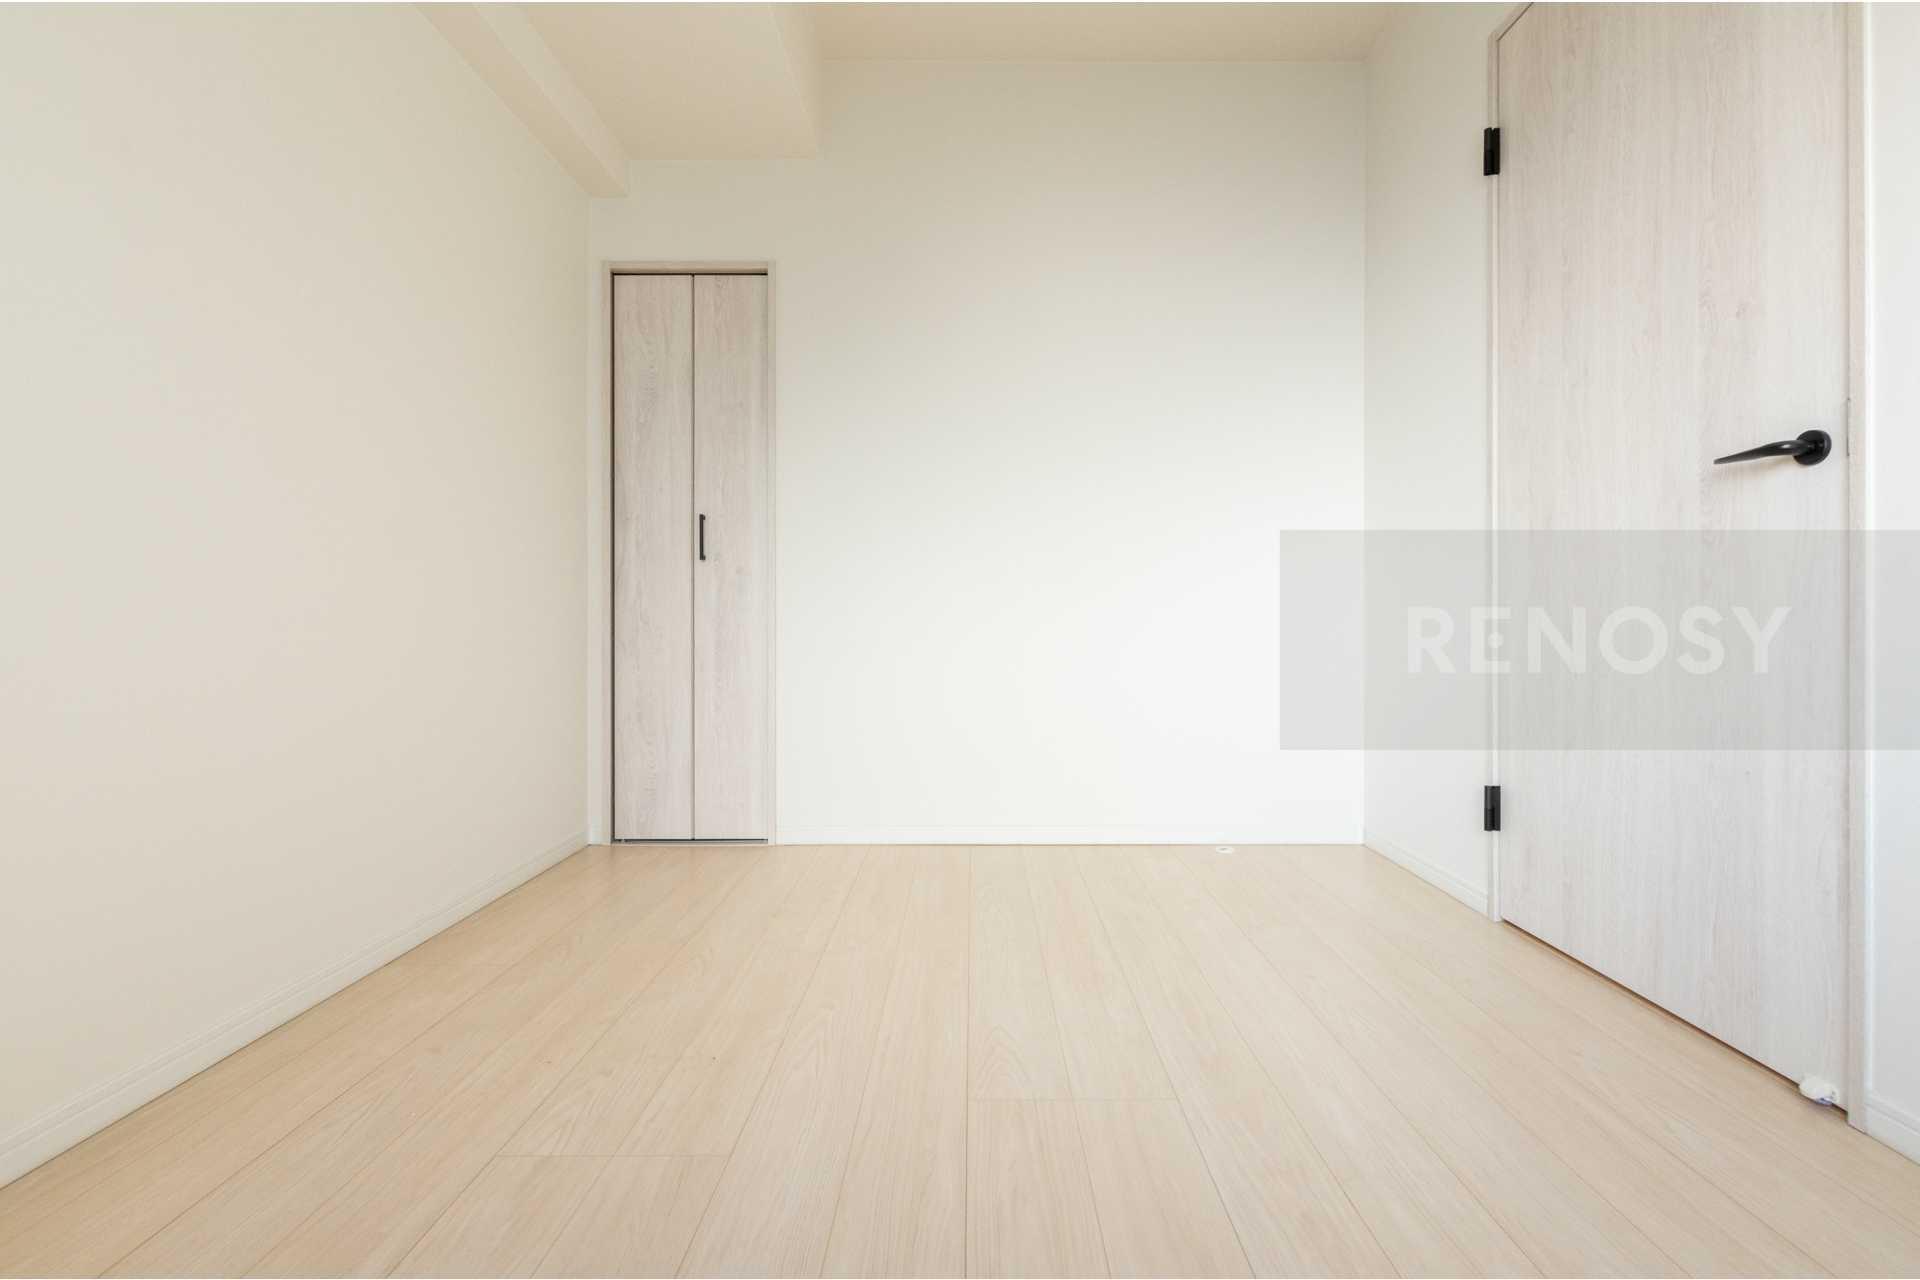 45_【ldd3_sell】五反田リーラハイタウン903号室_20201202195947.jpg